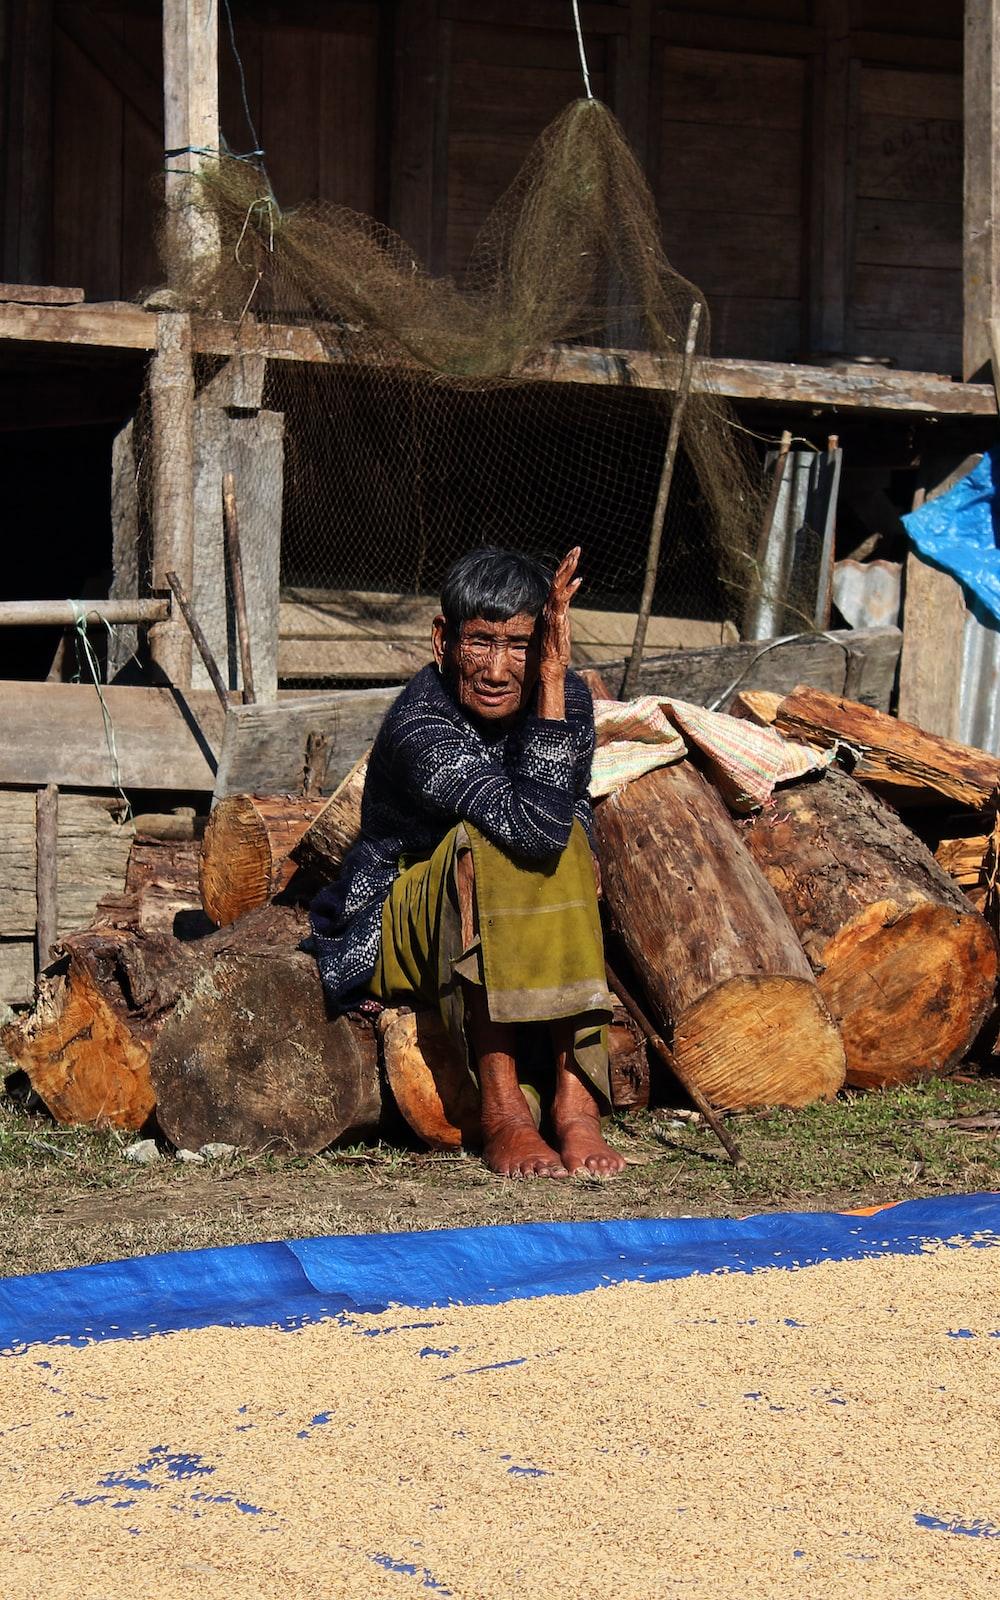 man in black and gray plaid dress shirt sitting on brown wood log